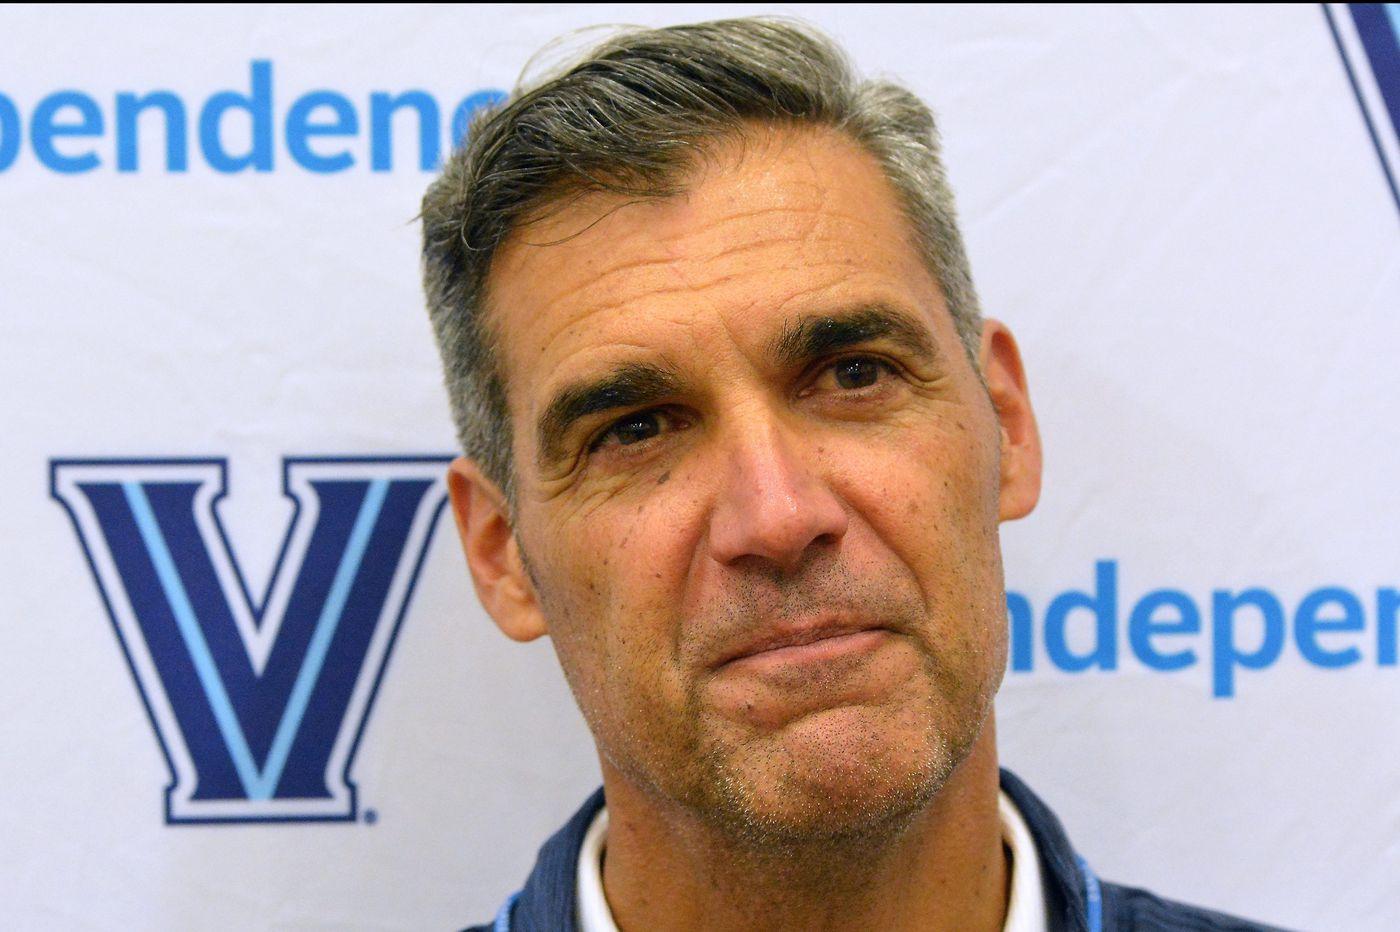 Villanova's Jay Wright named assistant coach of 2019-20 U.S. national team